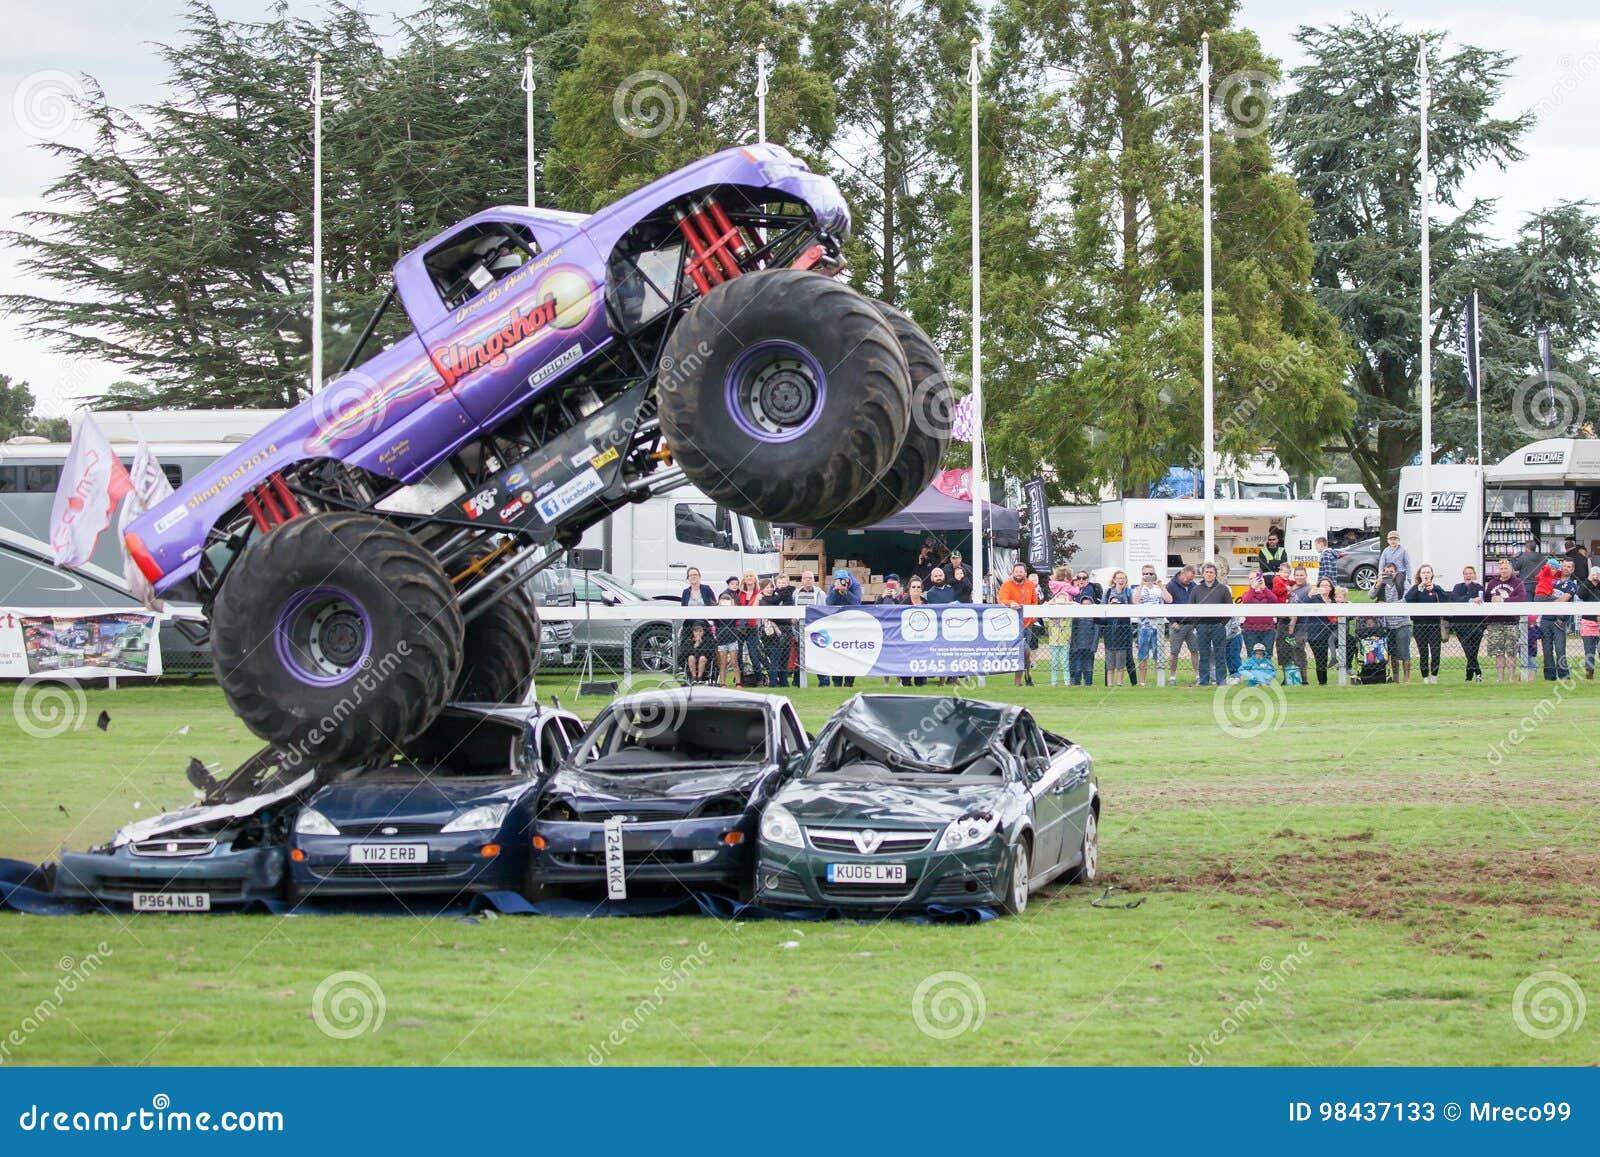 Estilingue do monster truck em Truckfest Norwich Reino Unido 2017